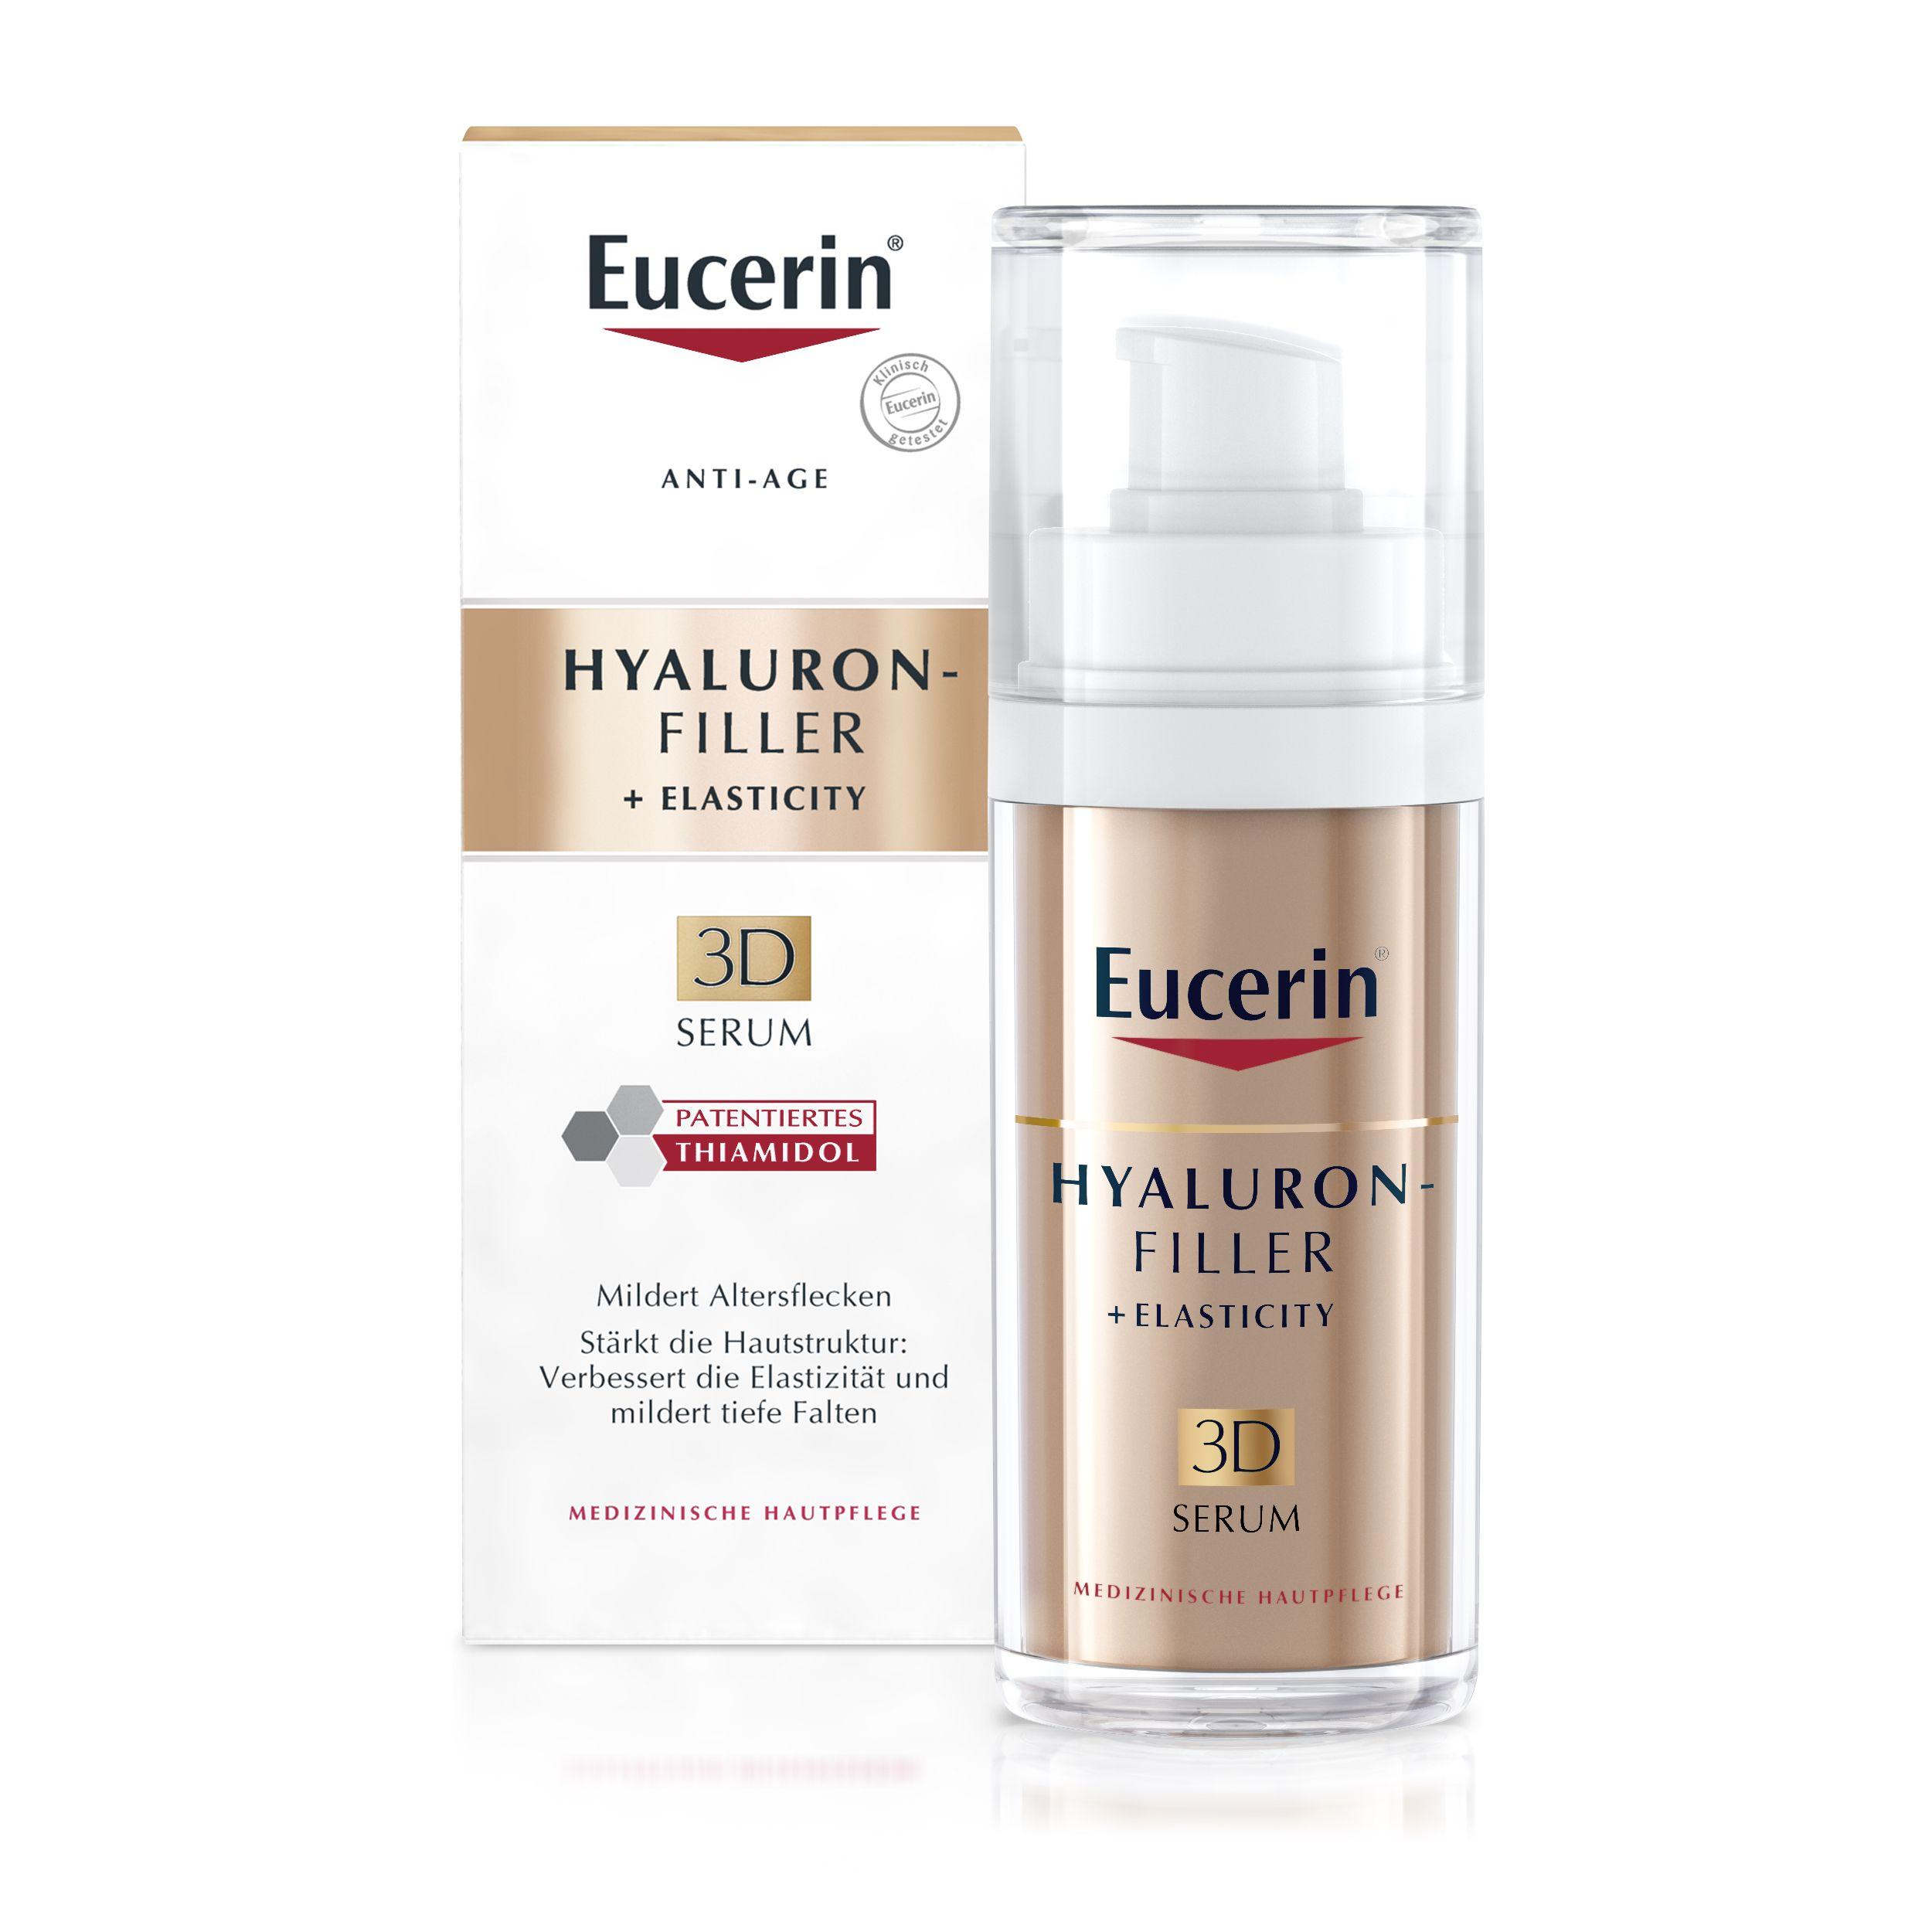 Eucerin Hyaluron Filler + Elasticity 3D Serum 30ml Anti..